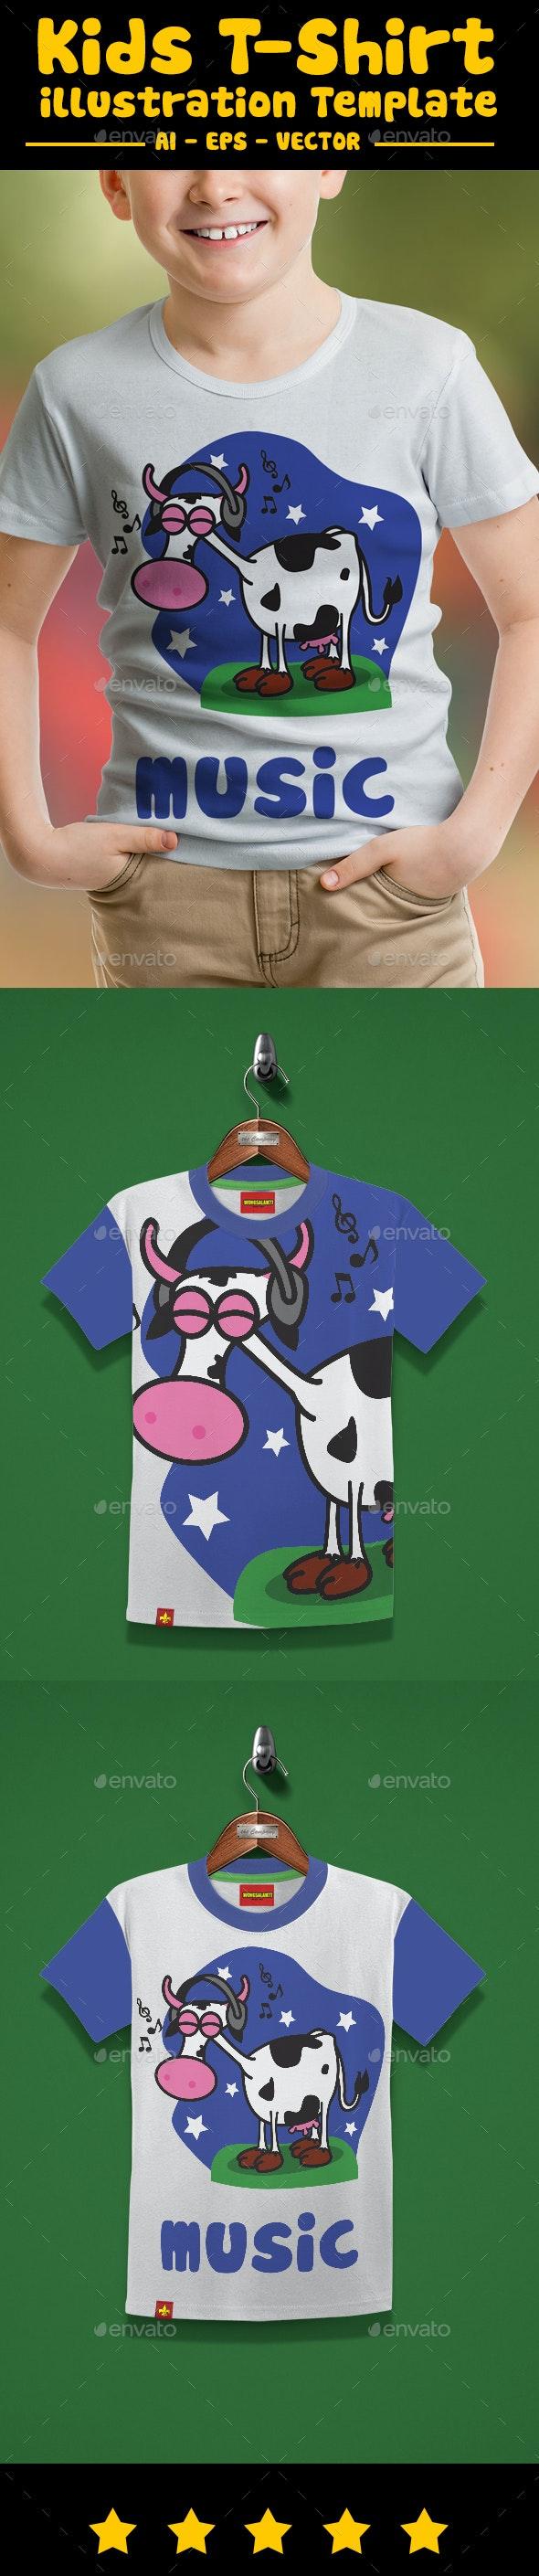 Cow Music Kids T-Shirt Design - Designs T-Shirts